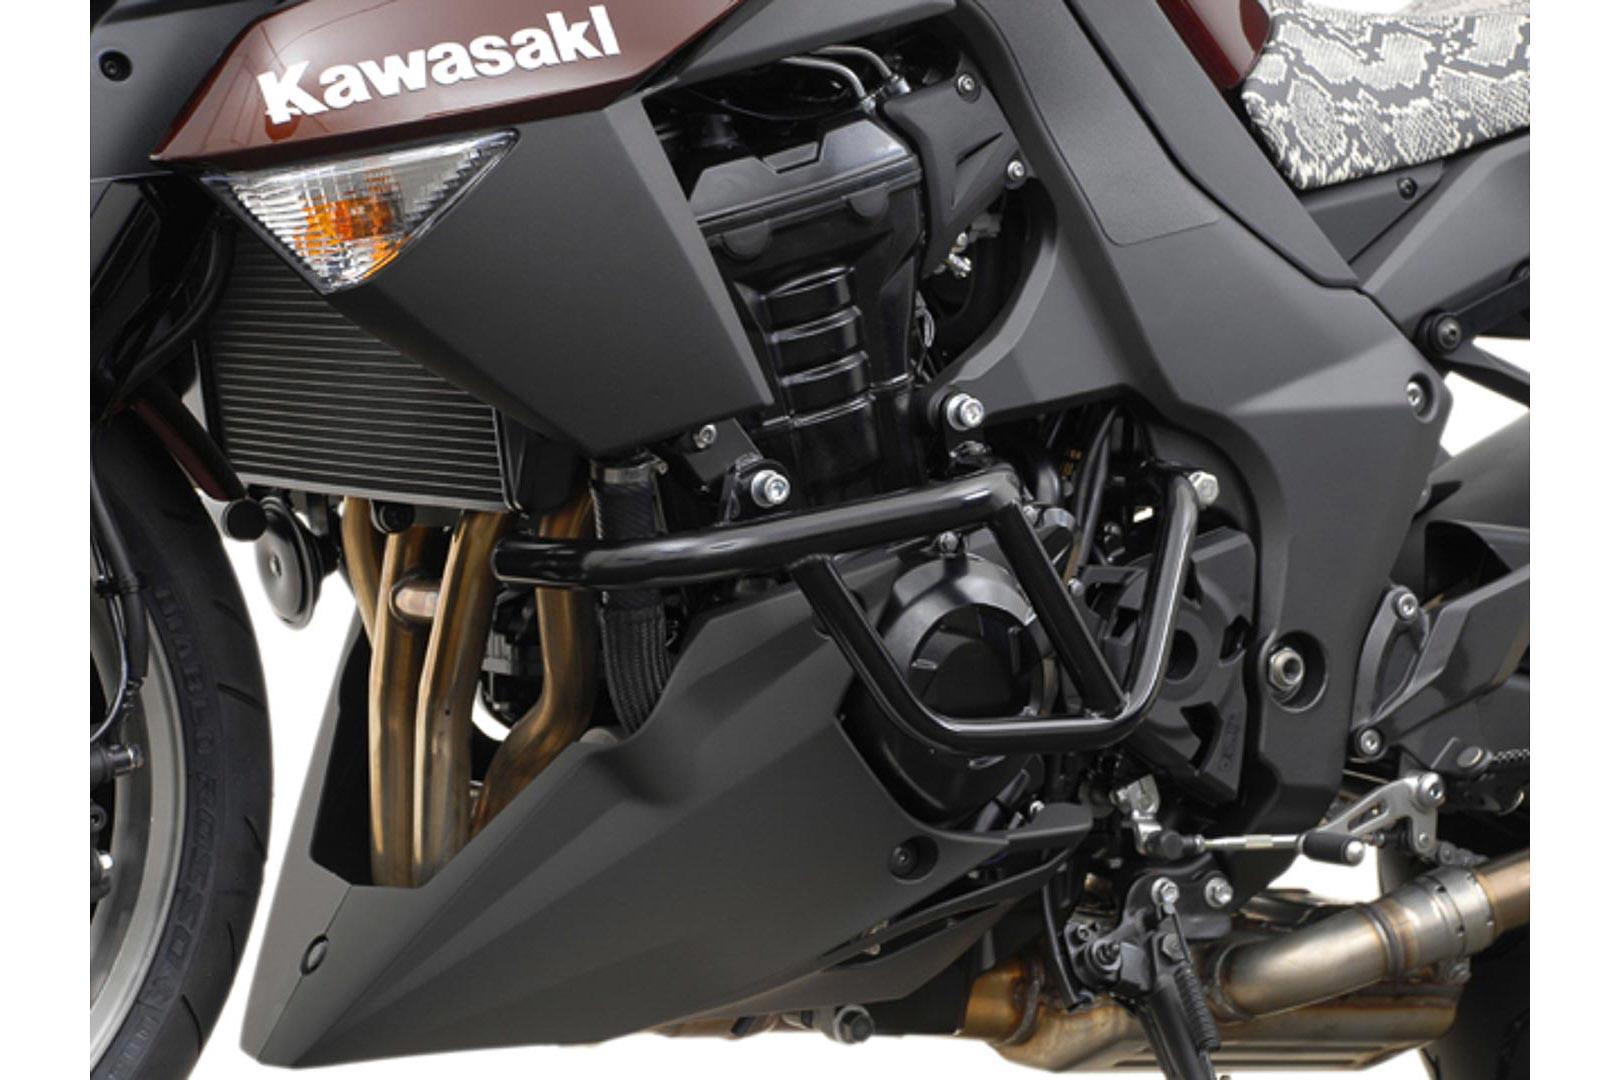 SW-Motech Moottorinsuojarauta Kawasaki Z1000 10-, musta